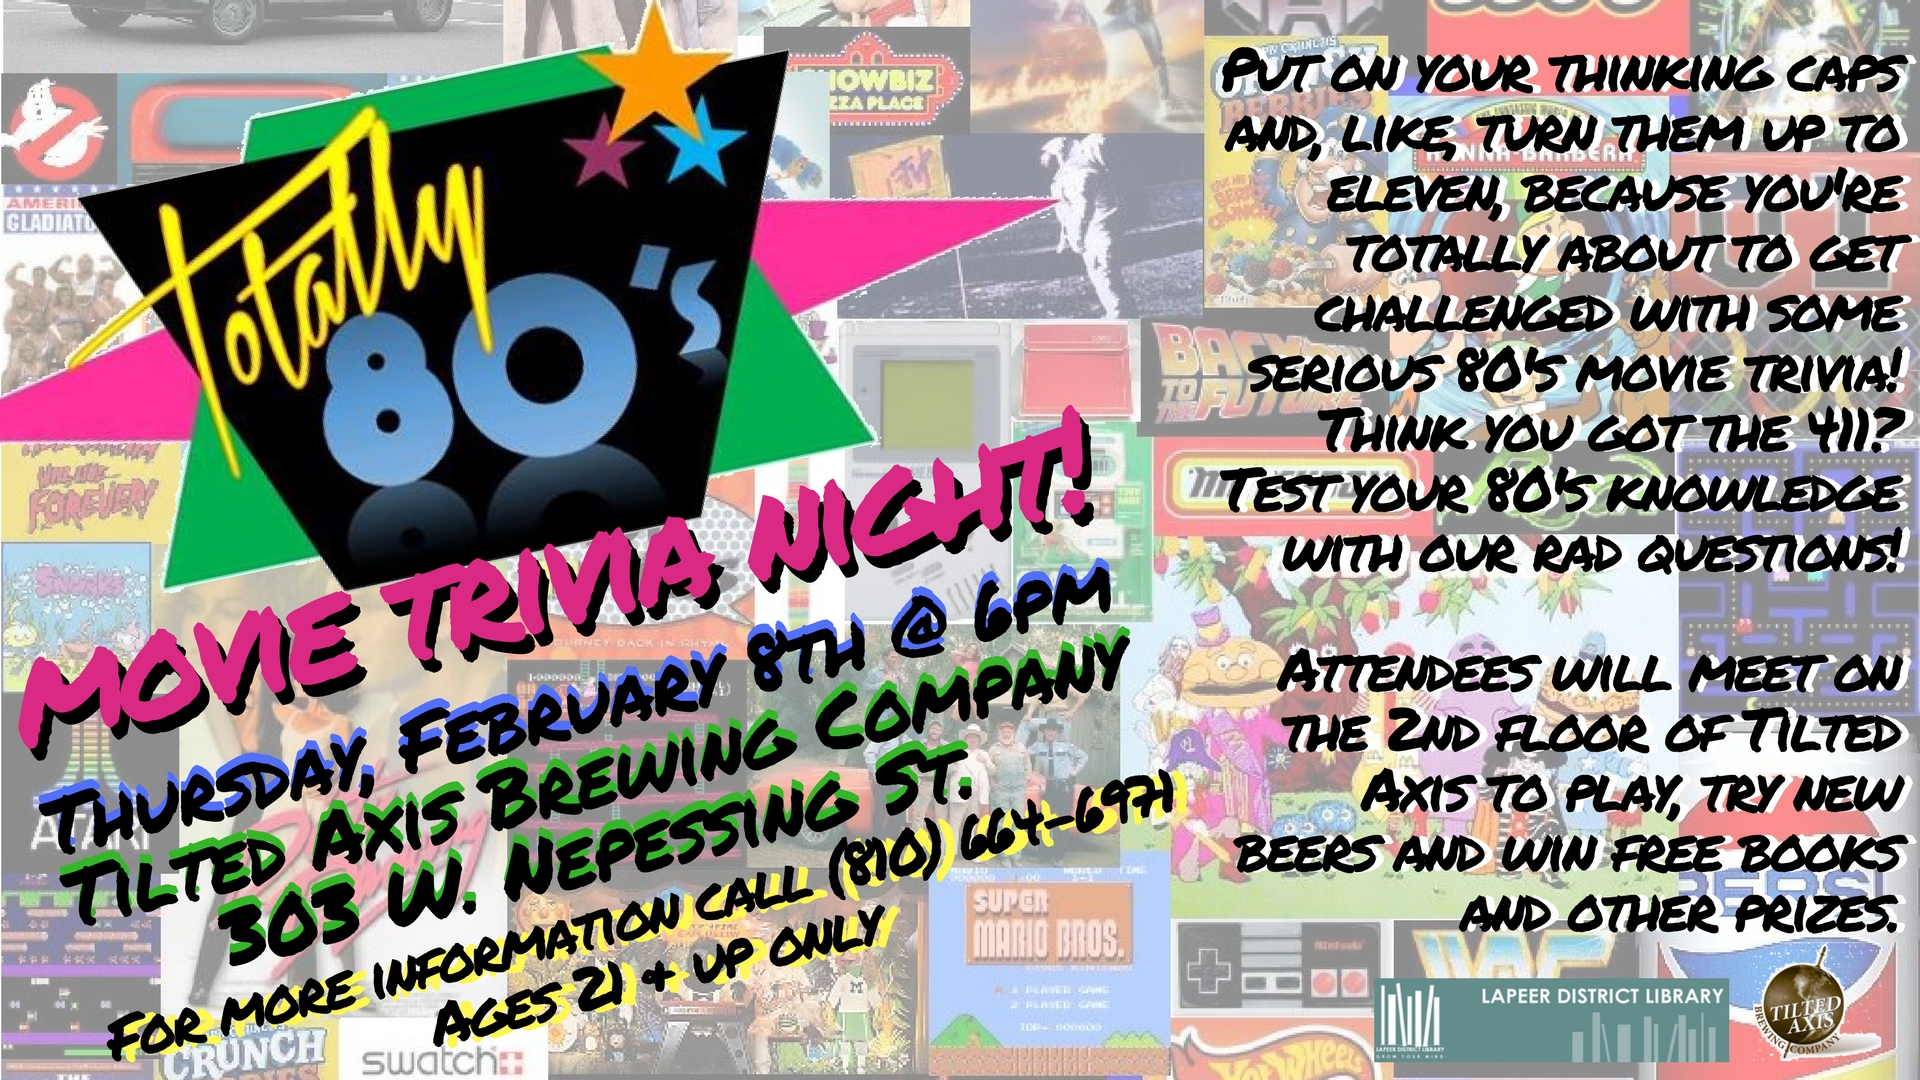 Totally 80's trivia night! - Thursday, February 8, 2018, 6:00 PM